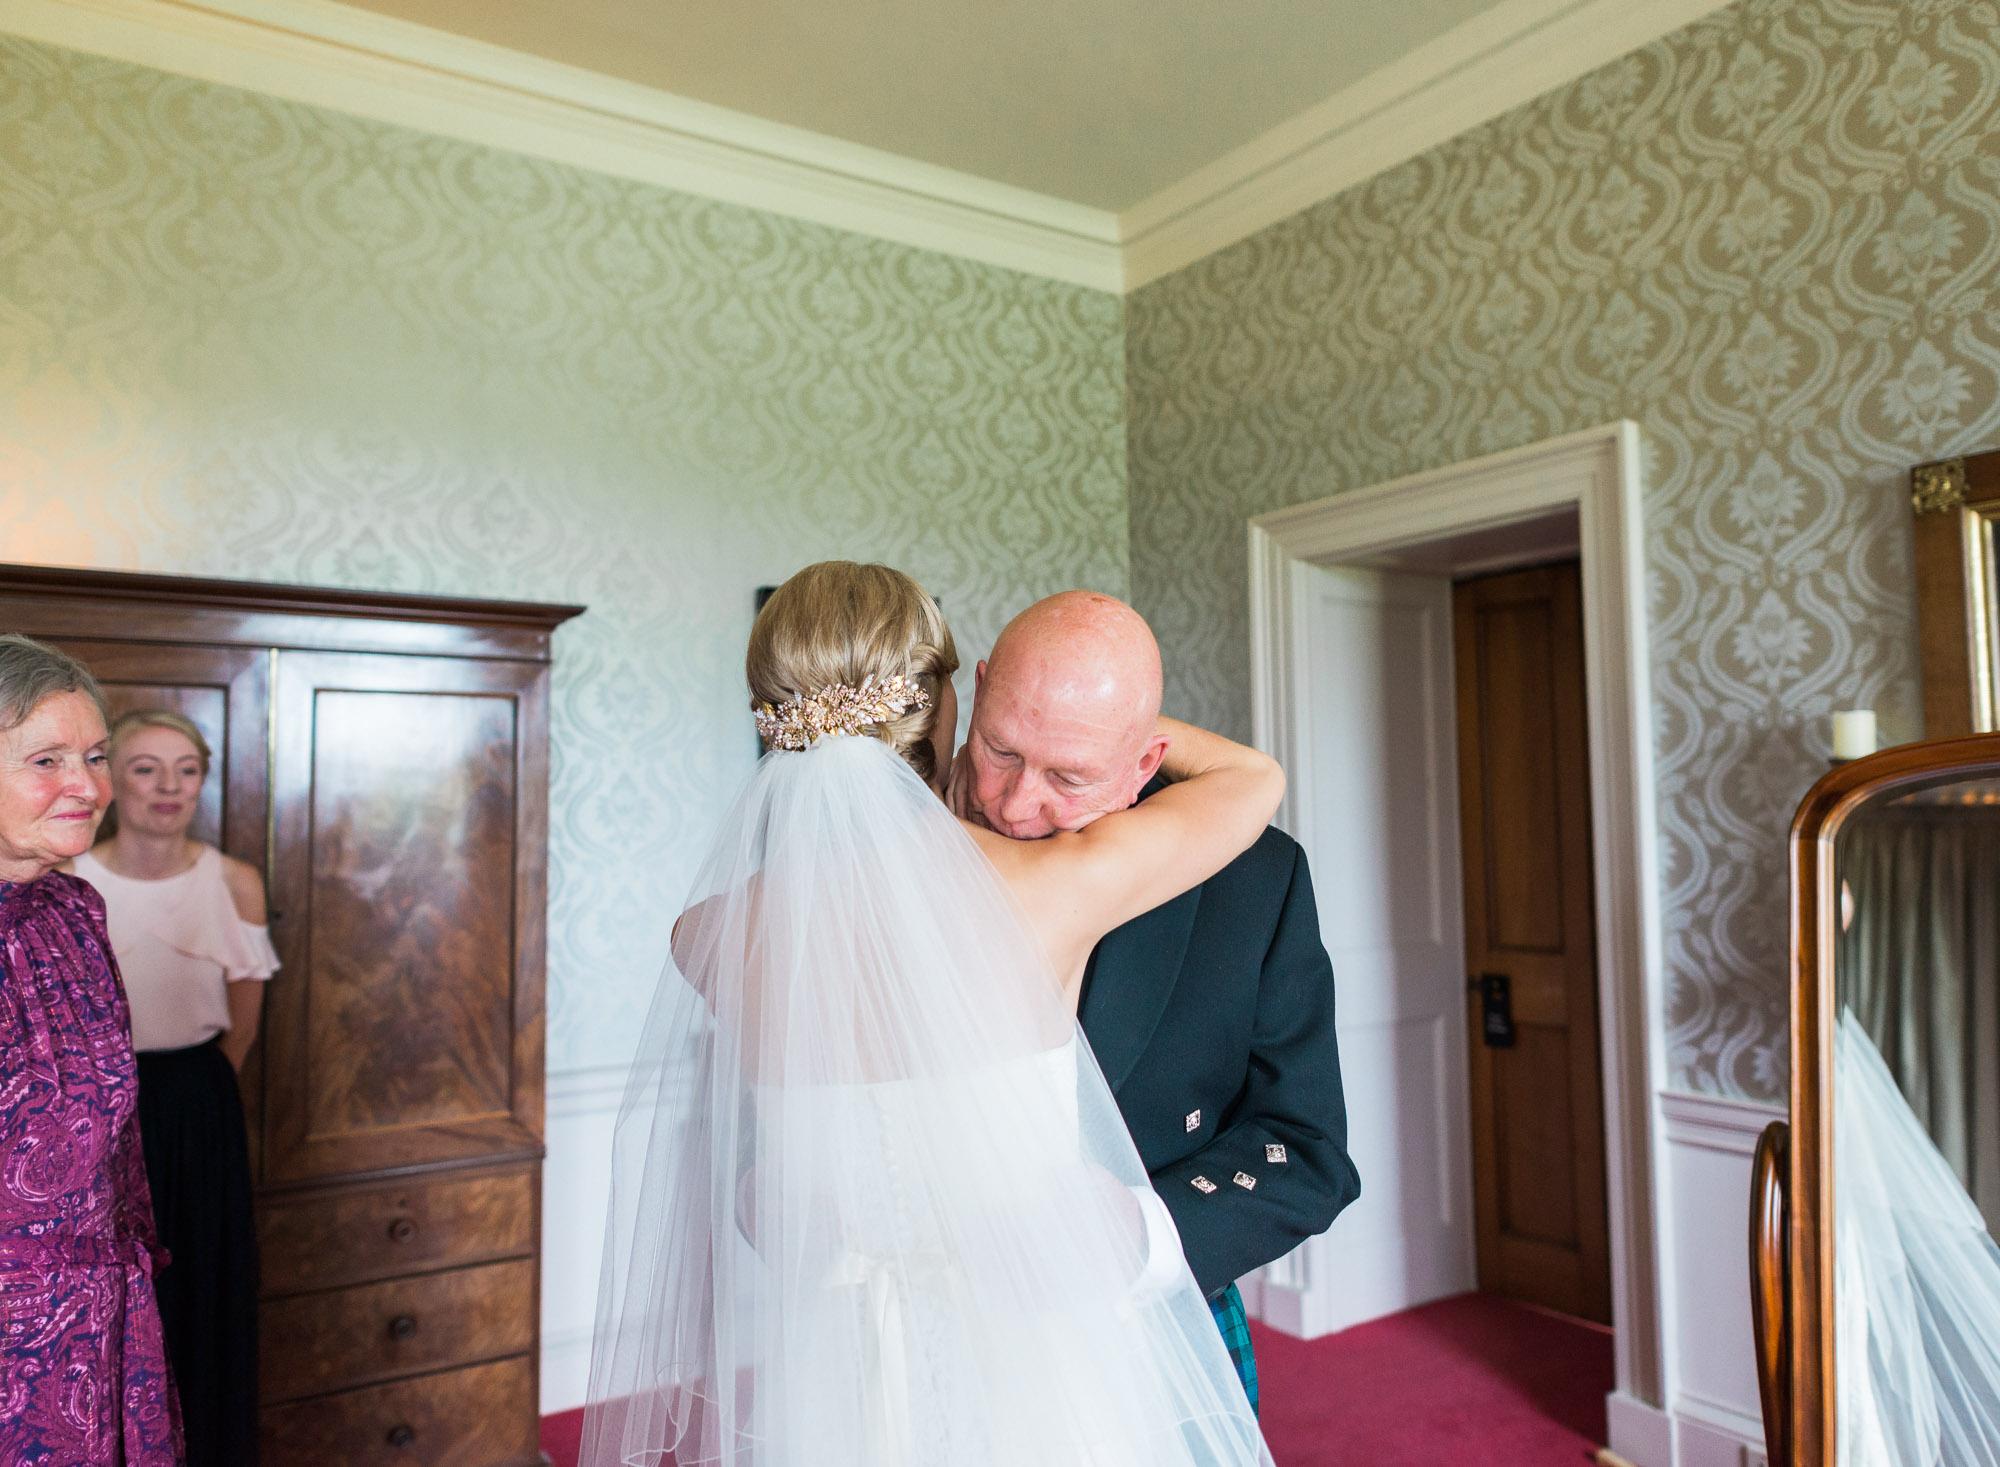 scottish_wedding_blairquhan_castle-60.jpg